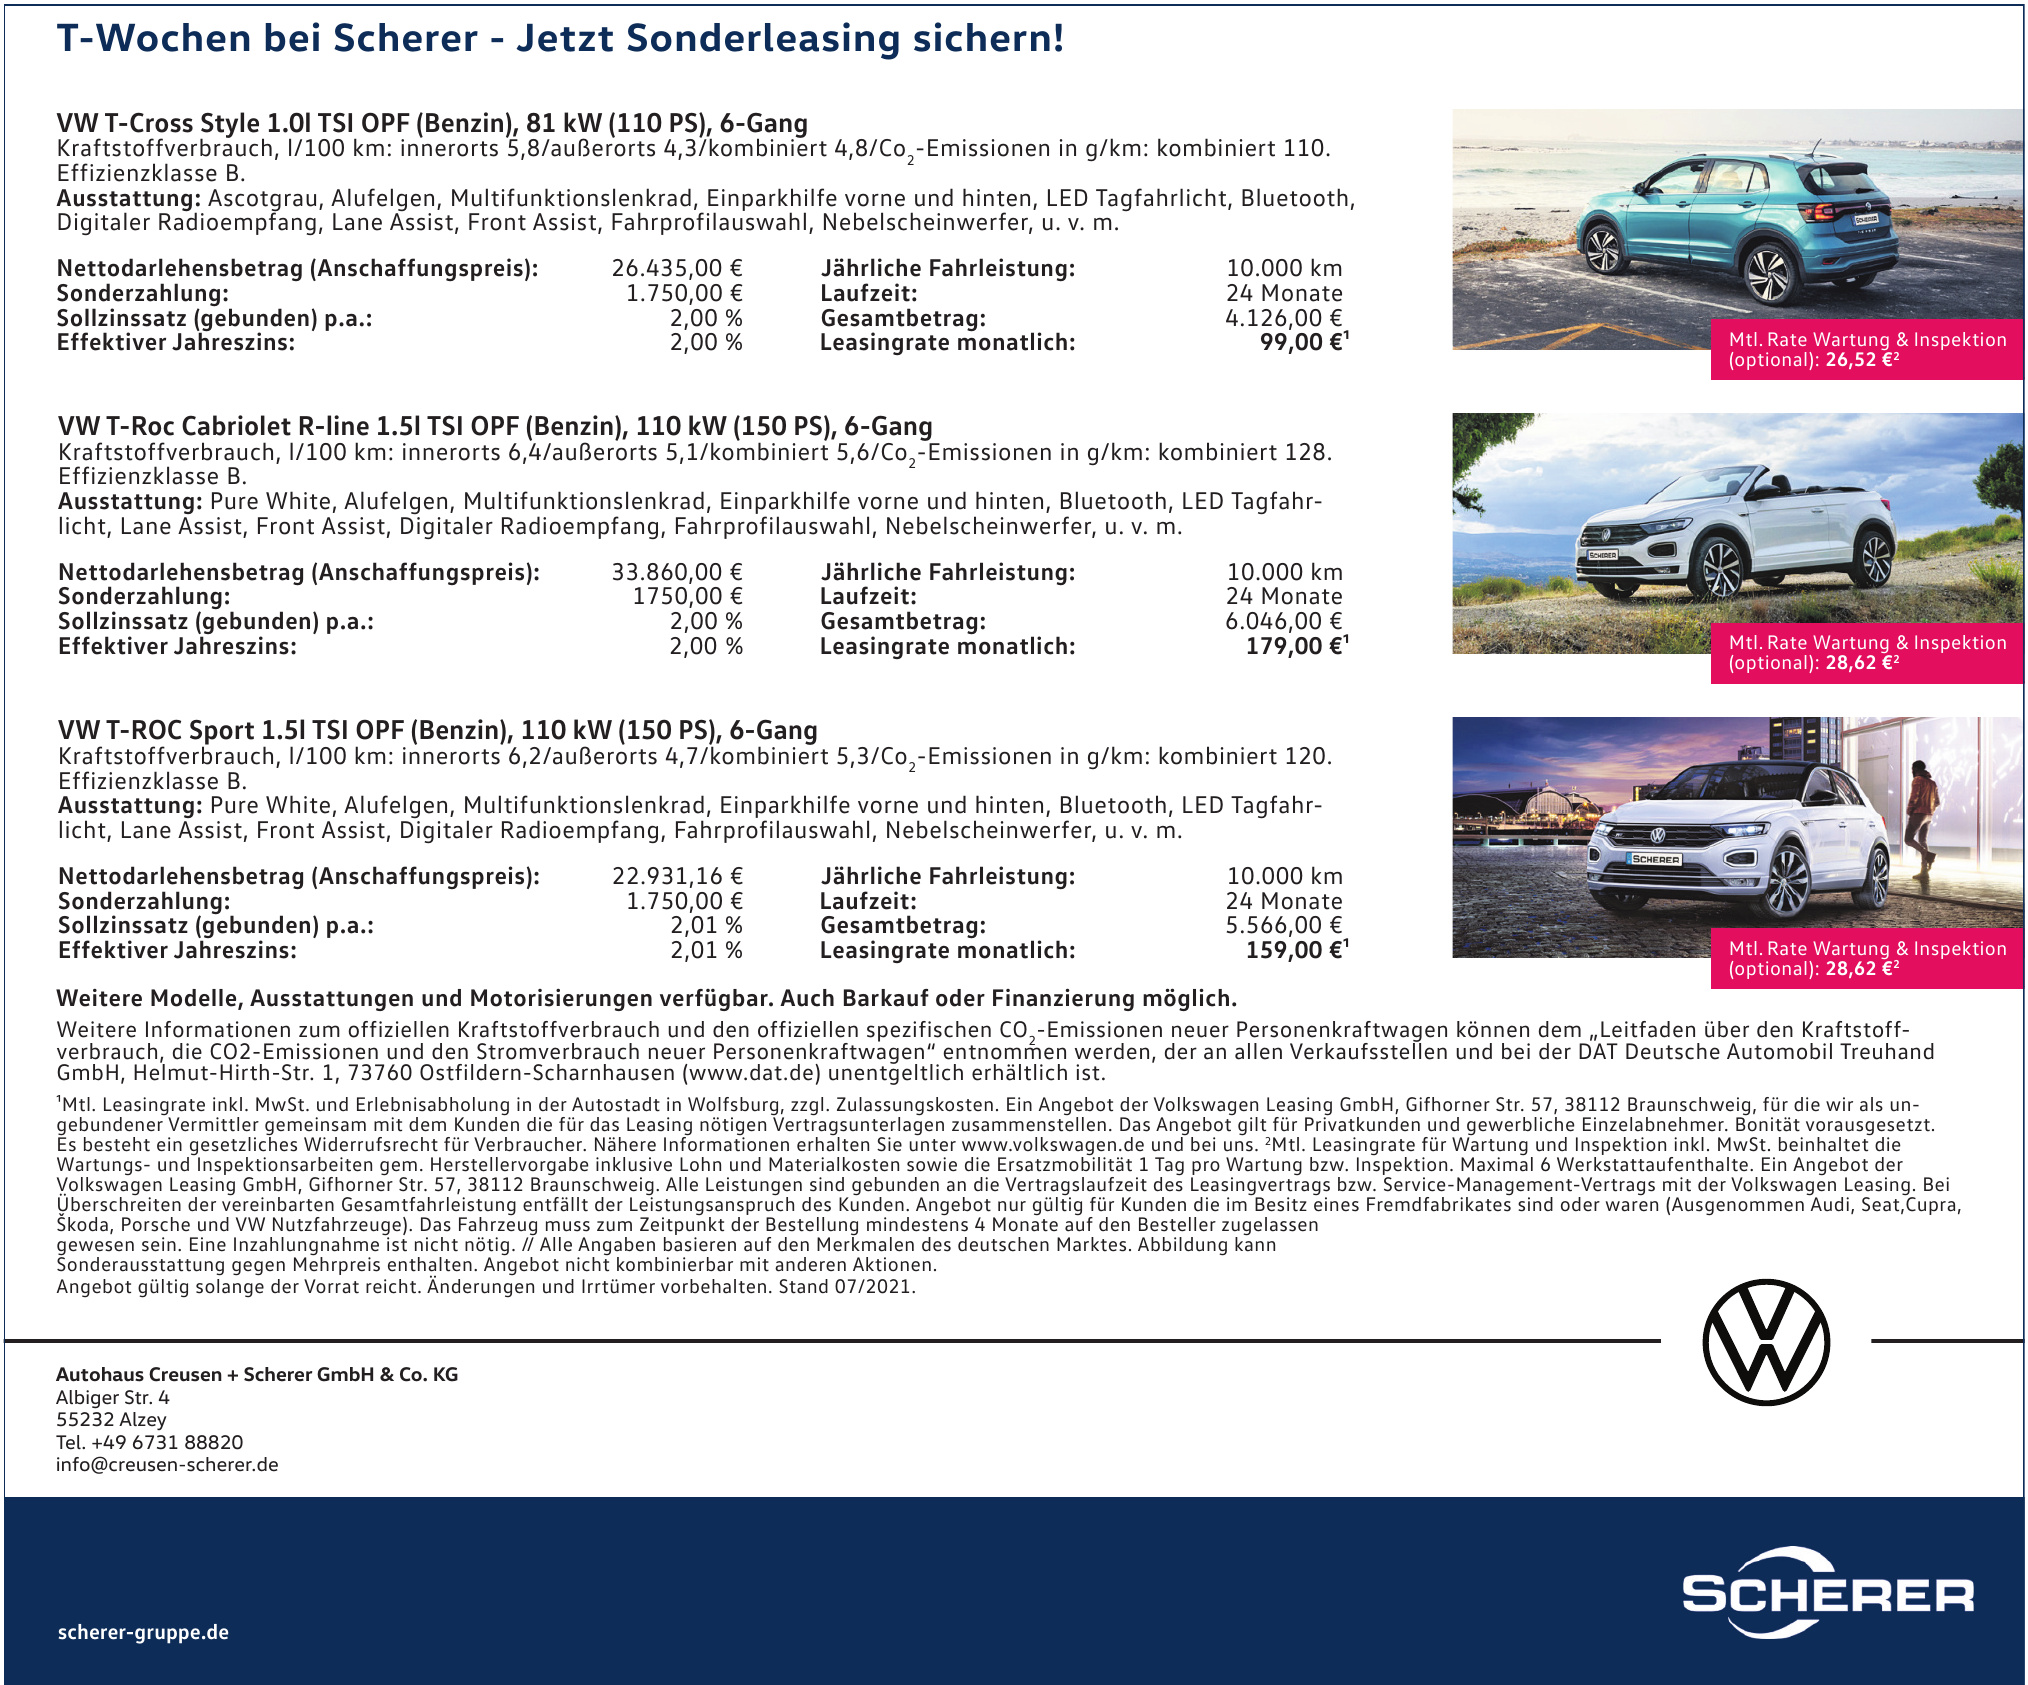 Autohaus Scherer GmbH & Co. KG